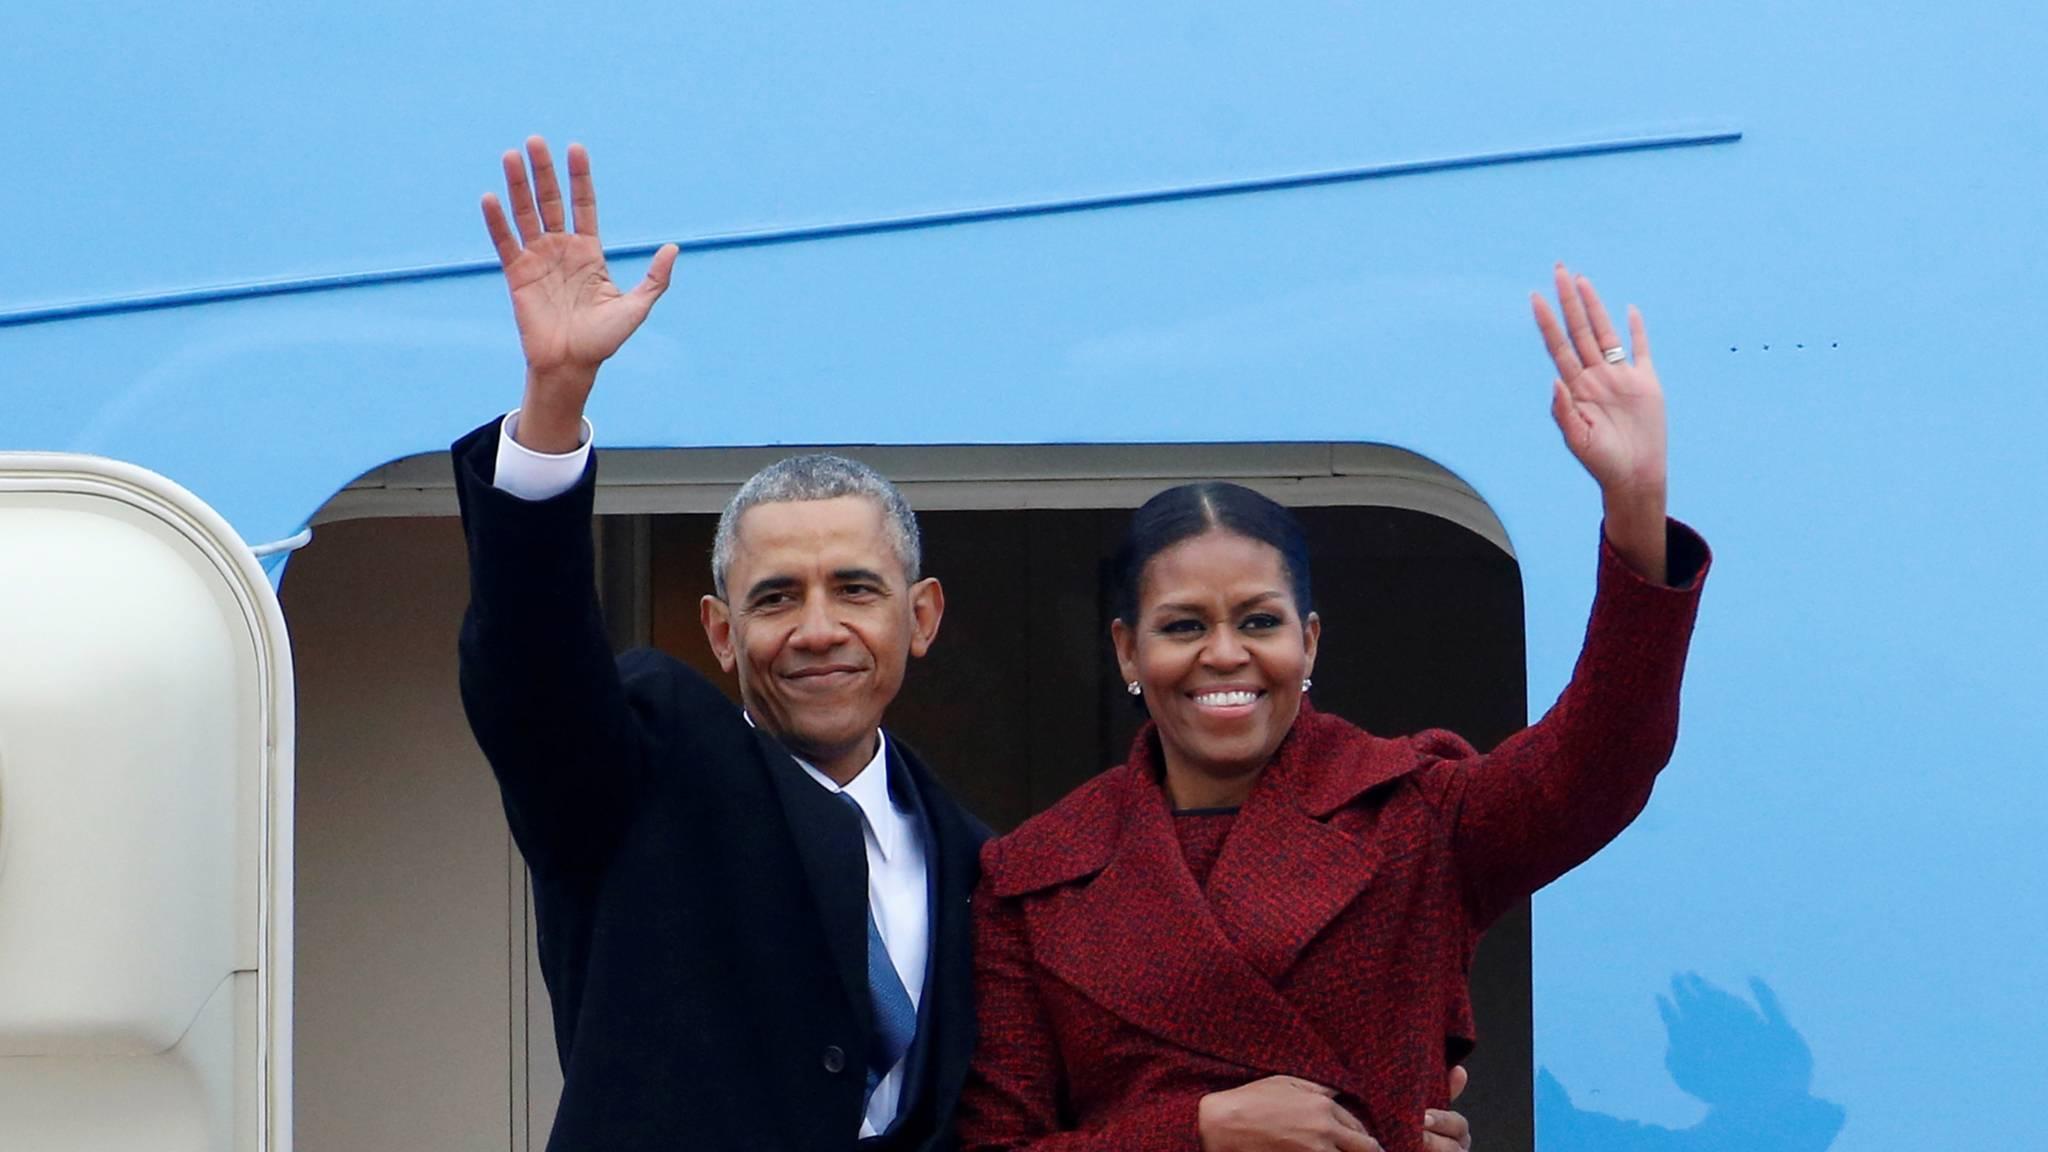 dating profiel Obama dating websites Toronto professionals